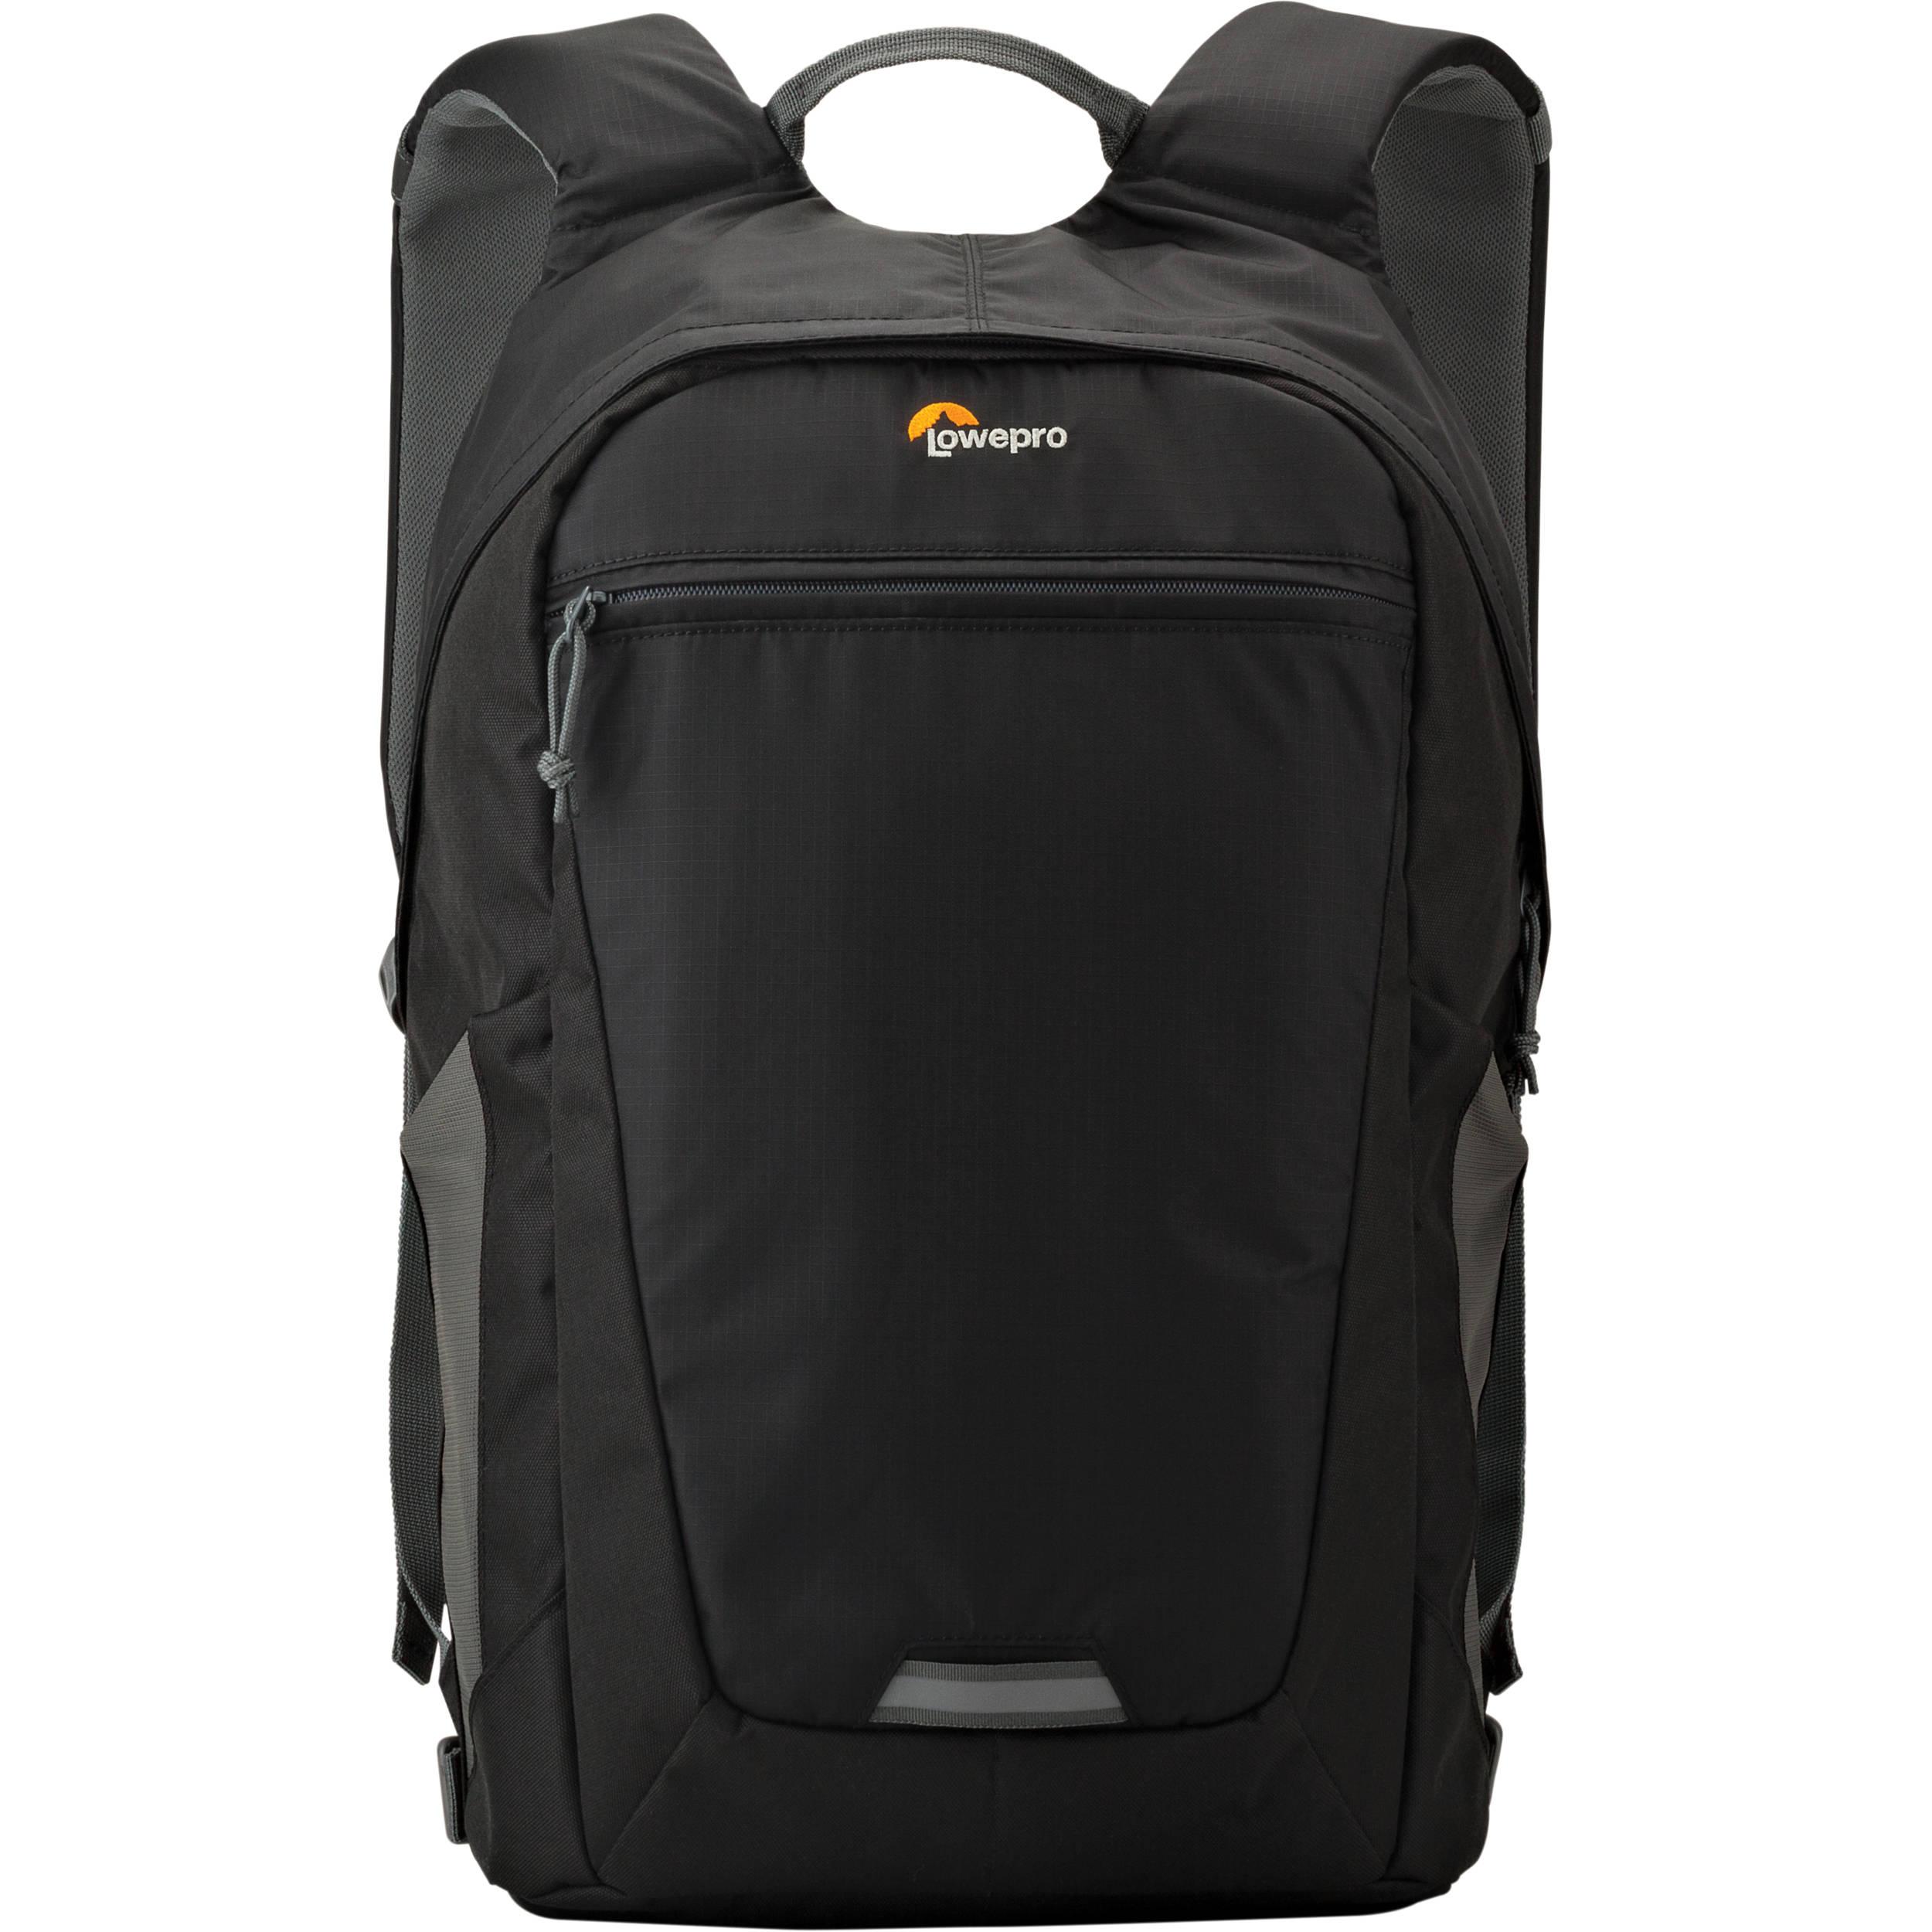 Lowepro Photo Hatchback Series BP 250 AW II Backpack (Black Gray) 2475cfa9359e7